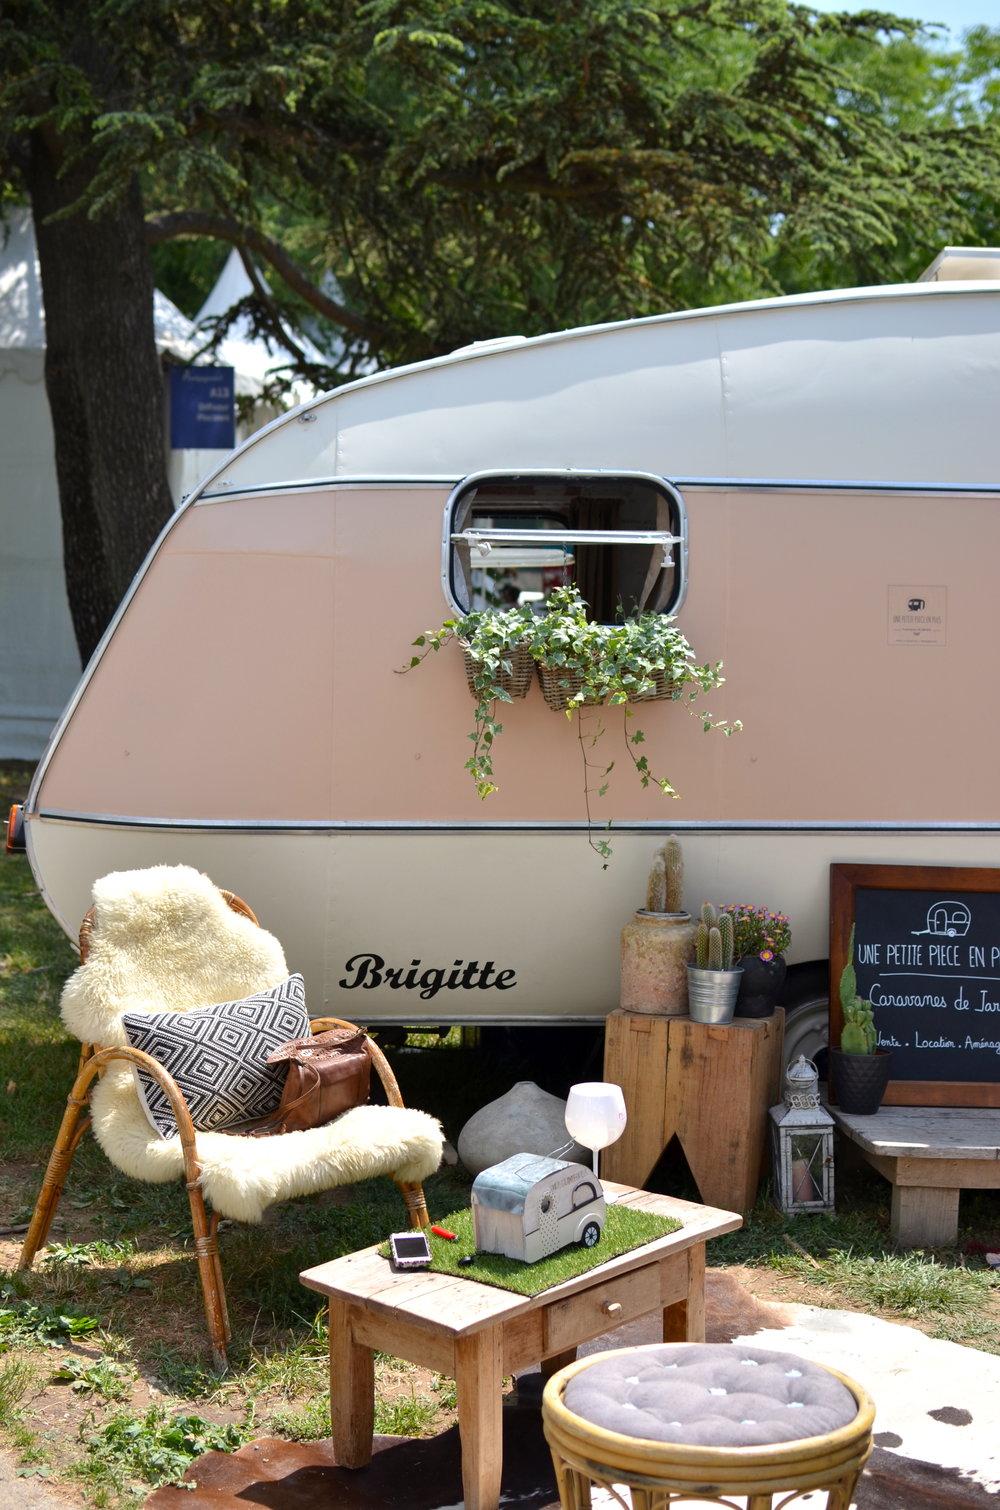 twinky lizzy blog aix en provence - cote sud 2017 31.jpg